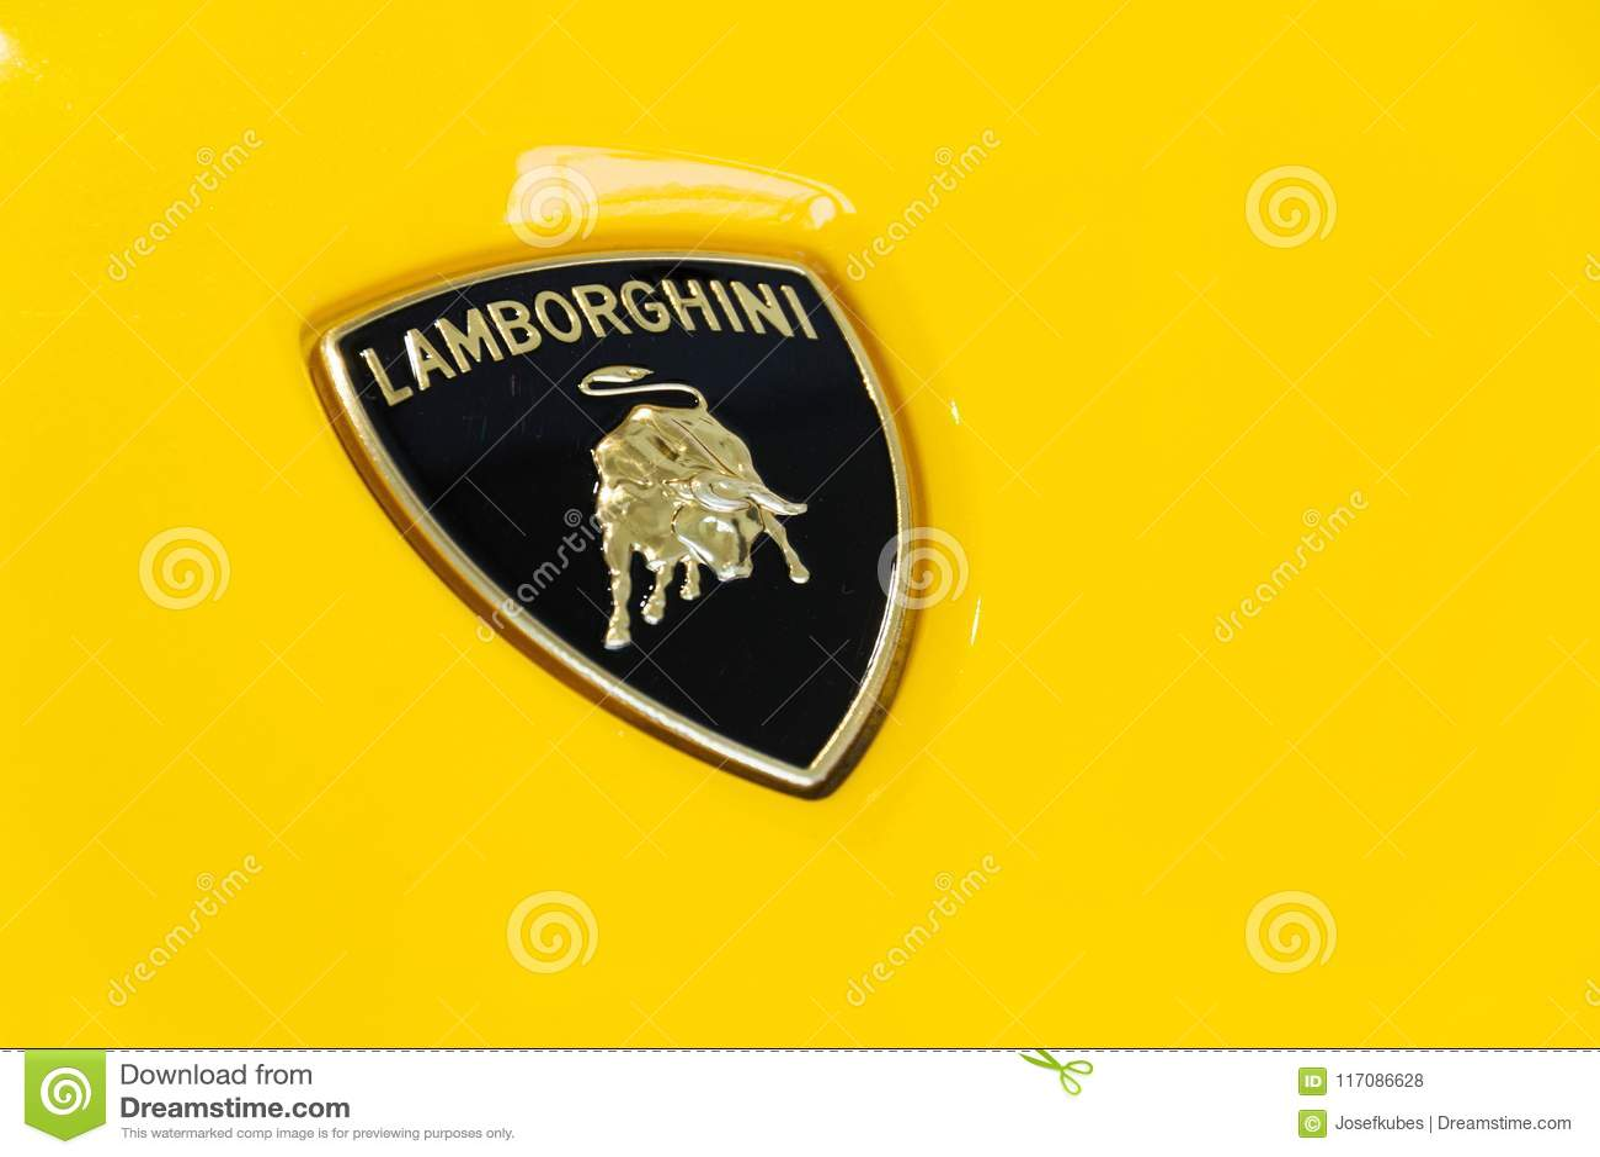 Lamborghini Company Logo On Lamborghini Aventador S Coupe Standing